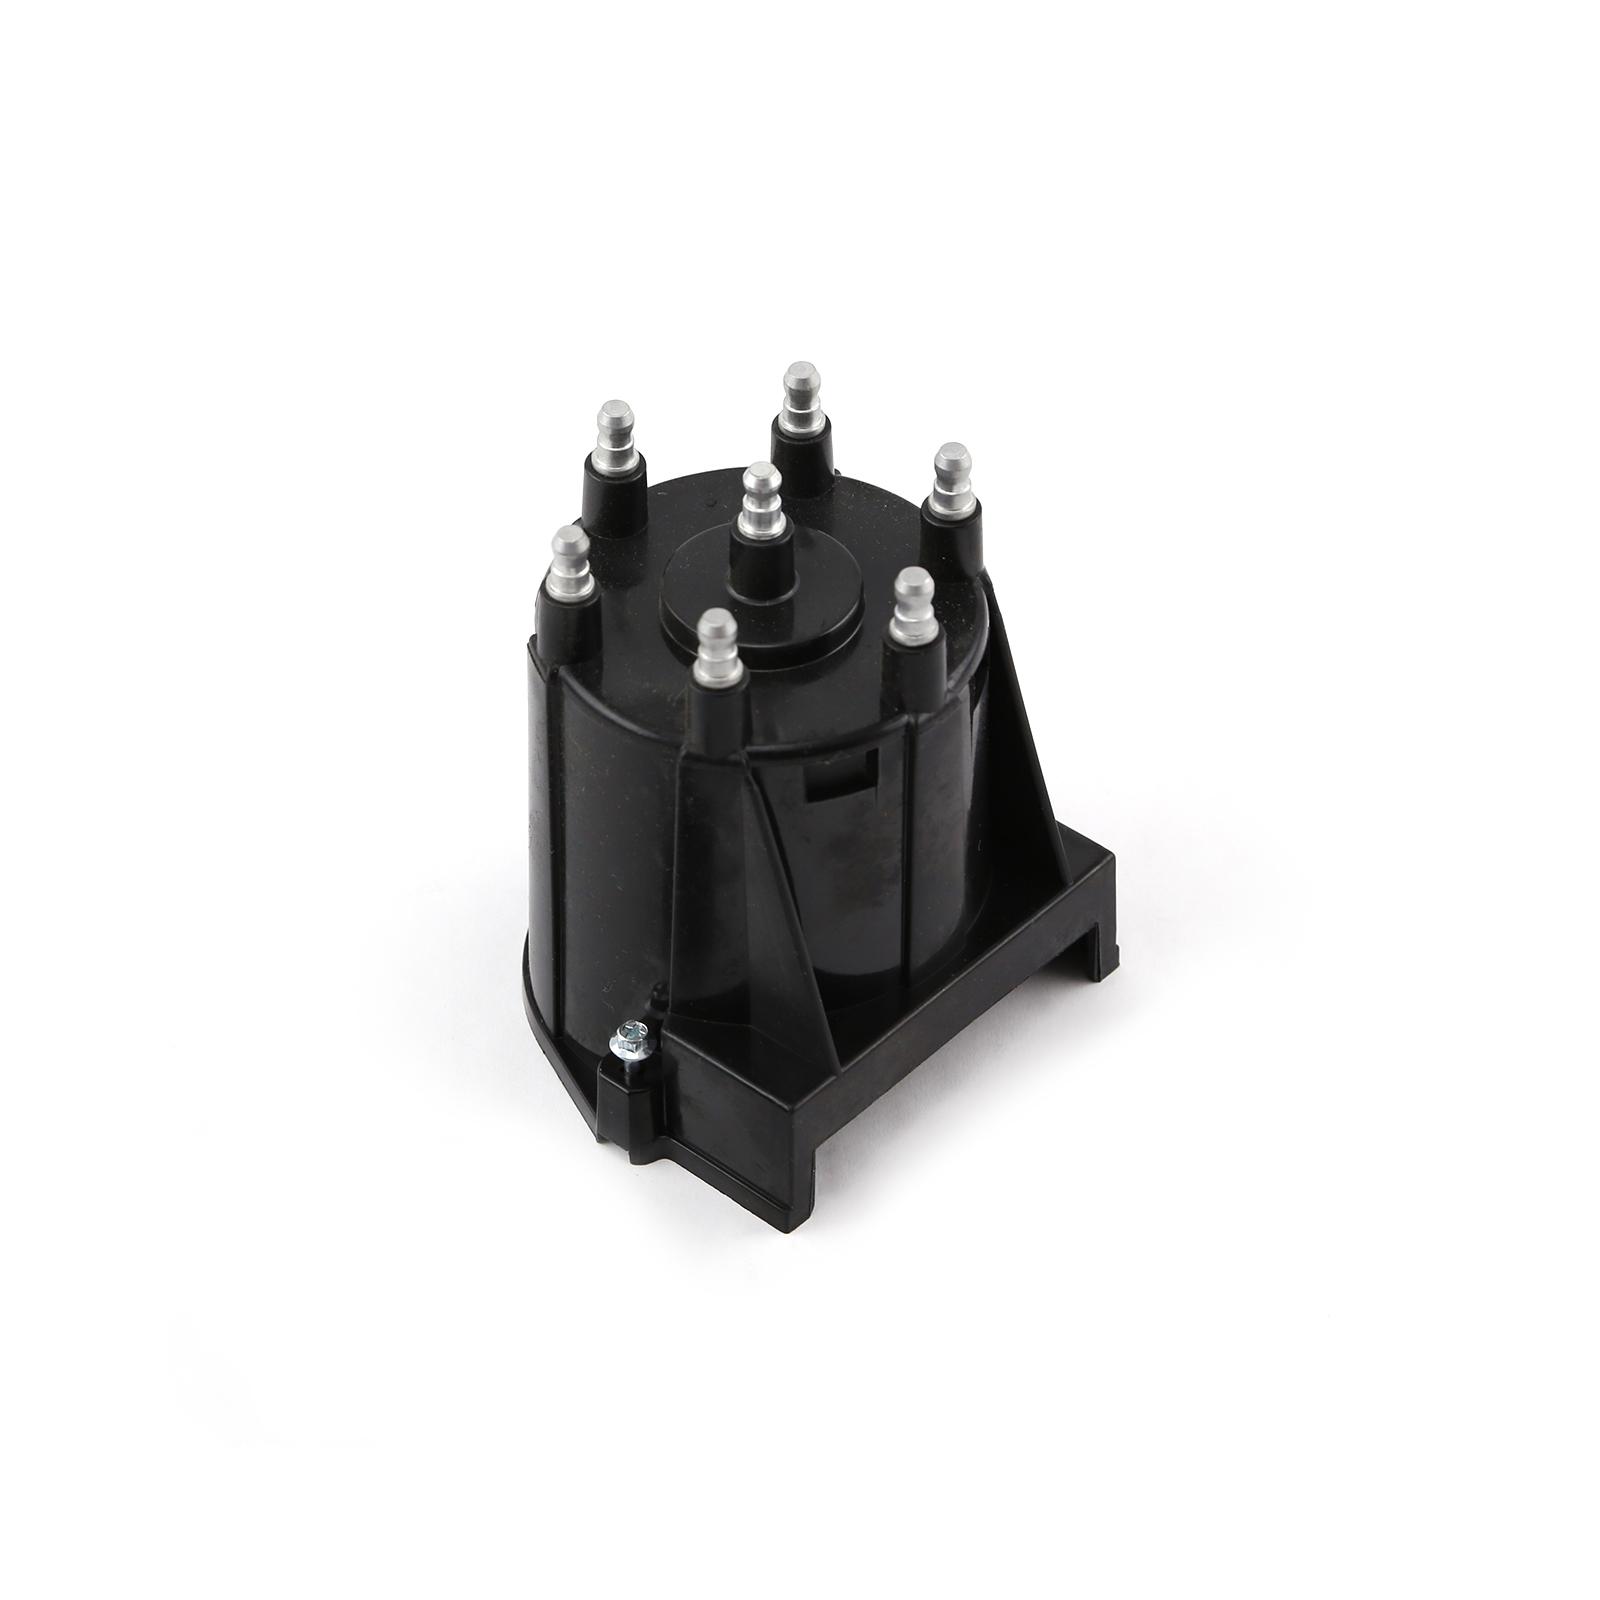 Pc10001-8 Series Replacement Distributor Cap Brass Terminals - Black